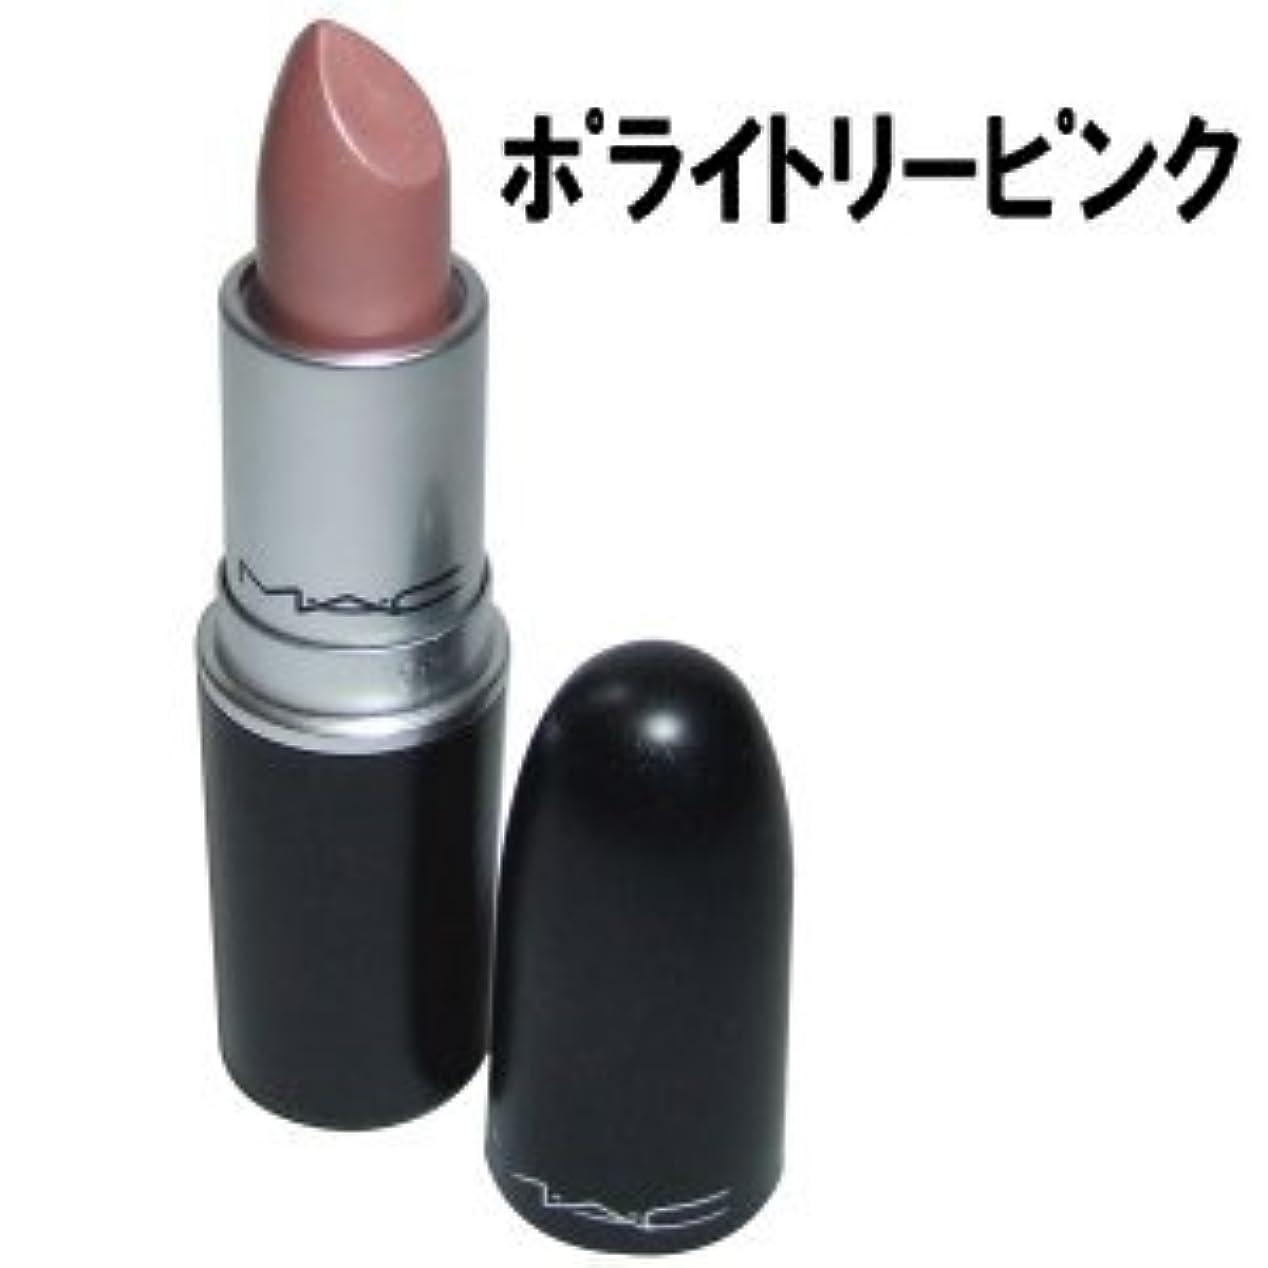 MAC リップ リップスティック #ポライトリー ピンク 【並行輸入品】